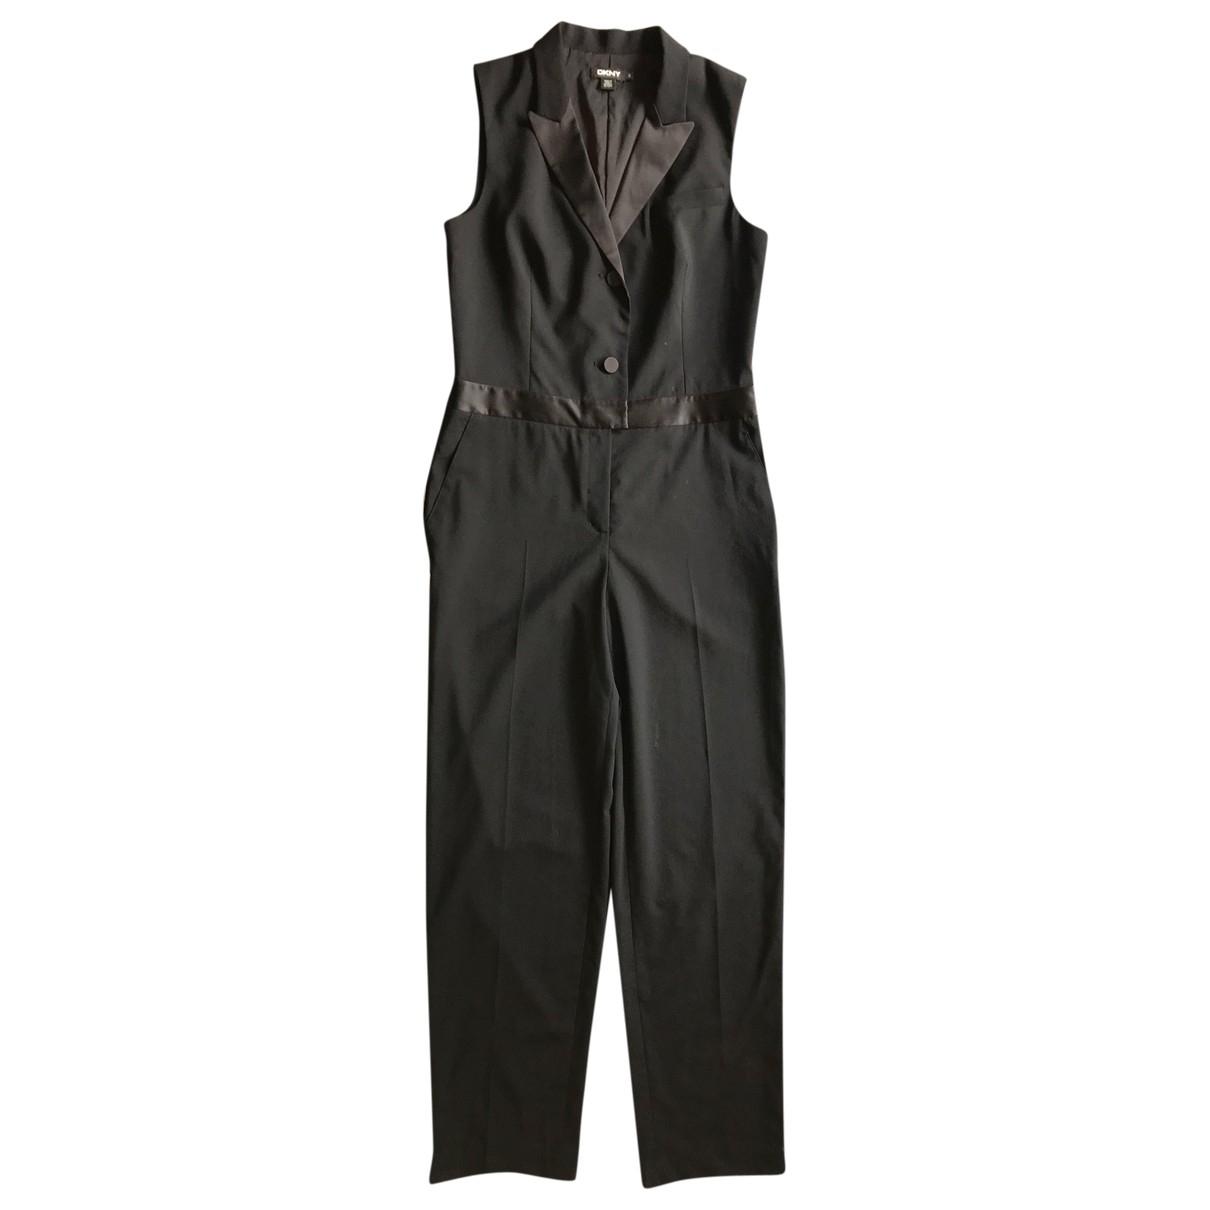 Dkny \N Black Wool jumpsuit for Women 12 US